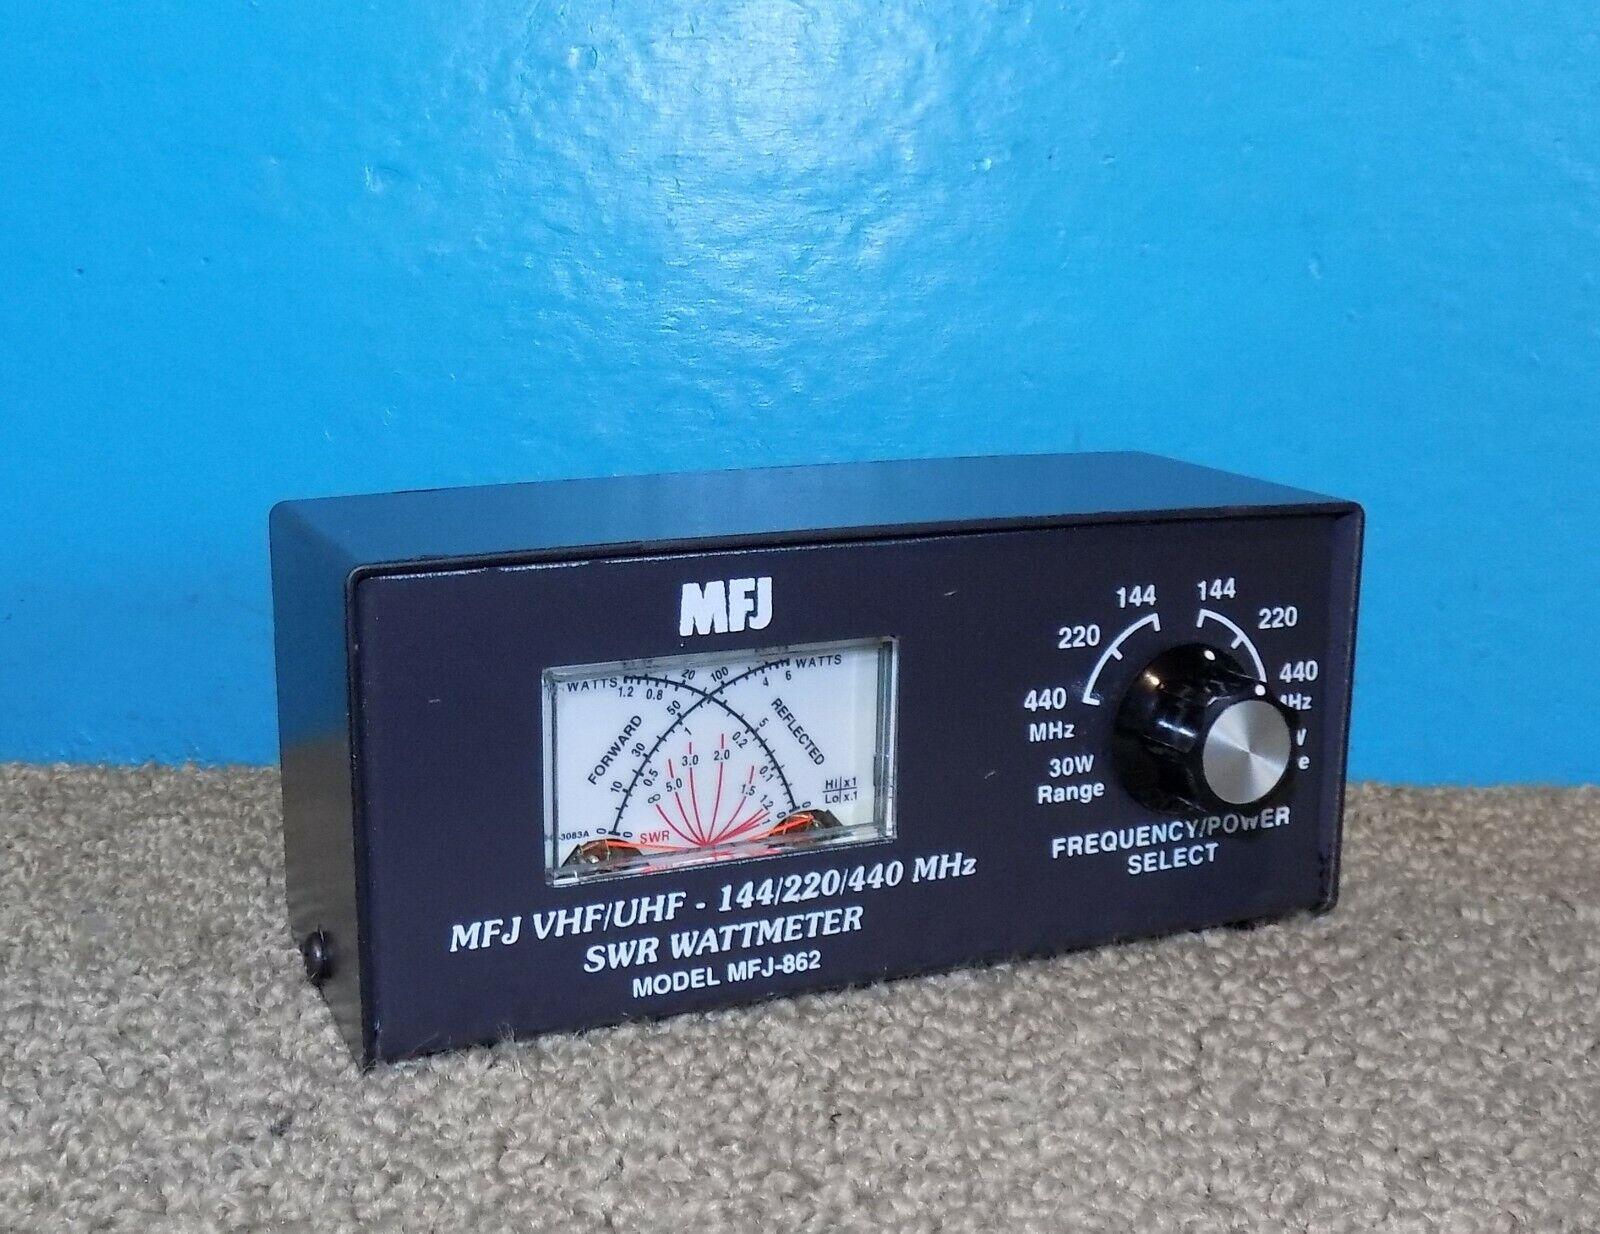 lilwing3 MFJ-862 VHF/UHF 144/220/440MHz SWR/Wattmeter Very Good Condition